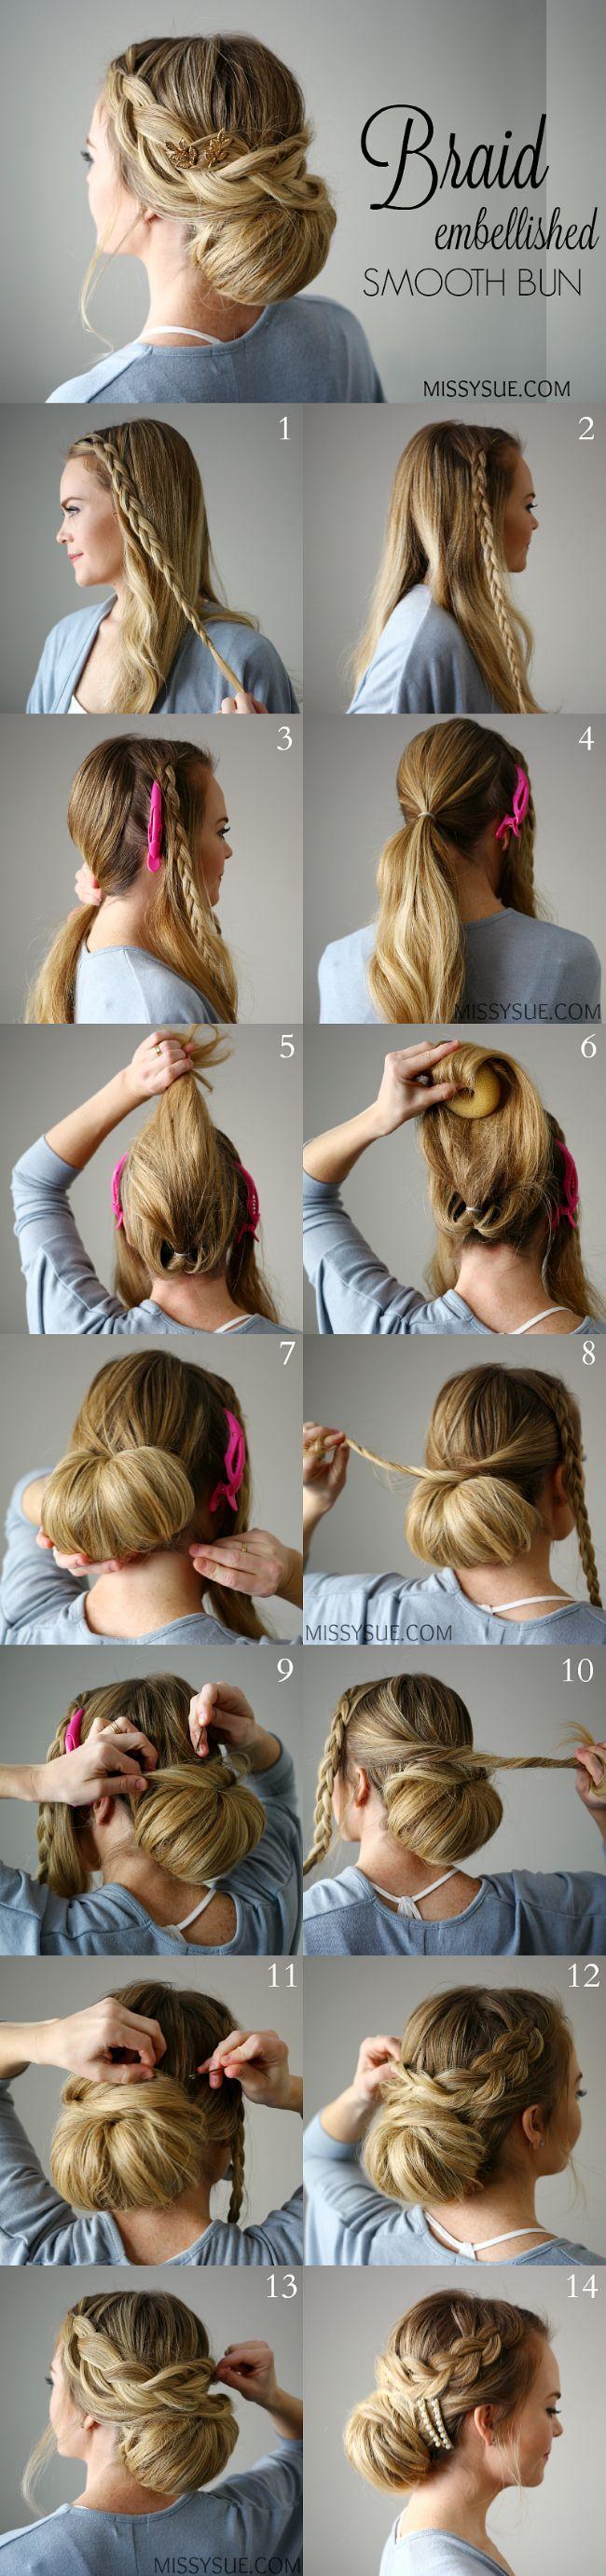 Braid embellished smooth bun hair pinterest smooth hair style